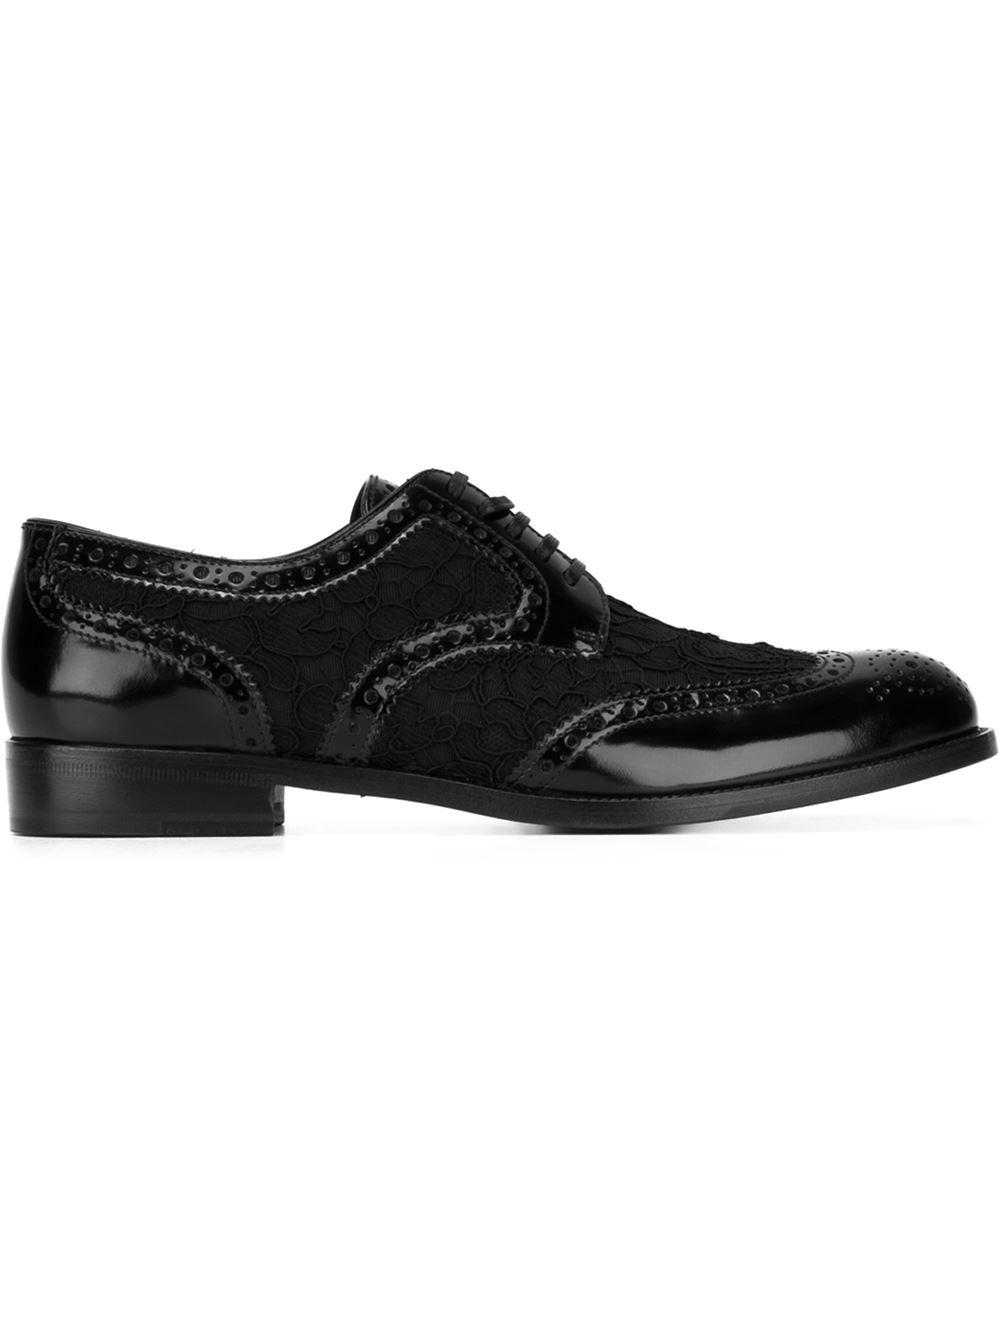 Dolce & Gabbana - chaussures (475€)